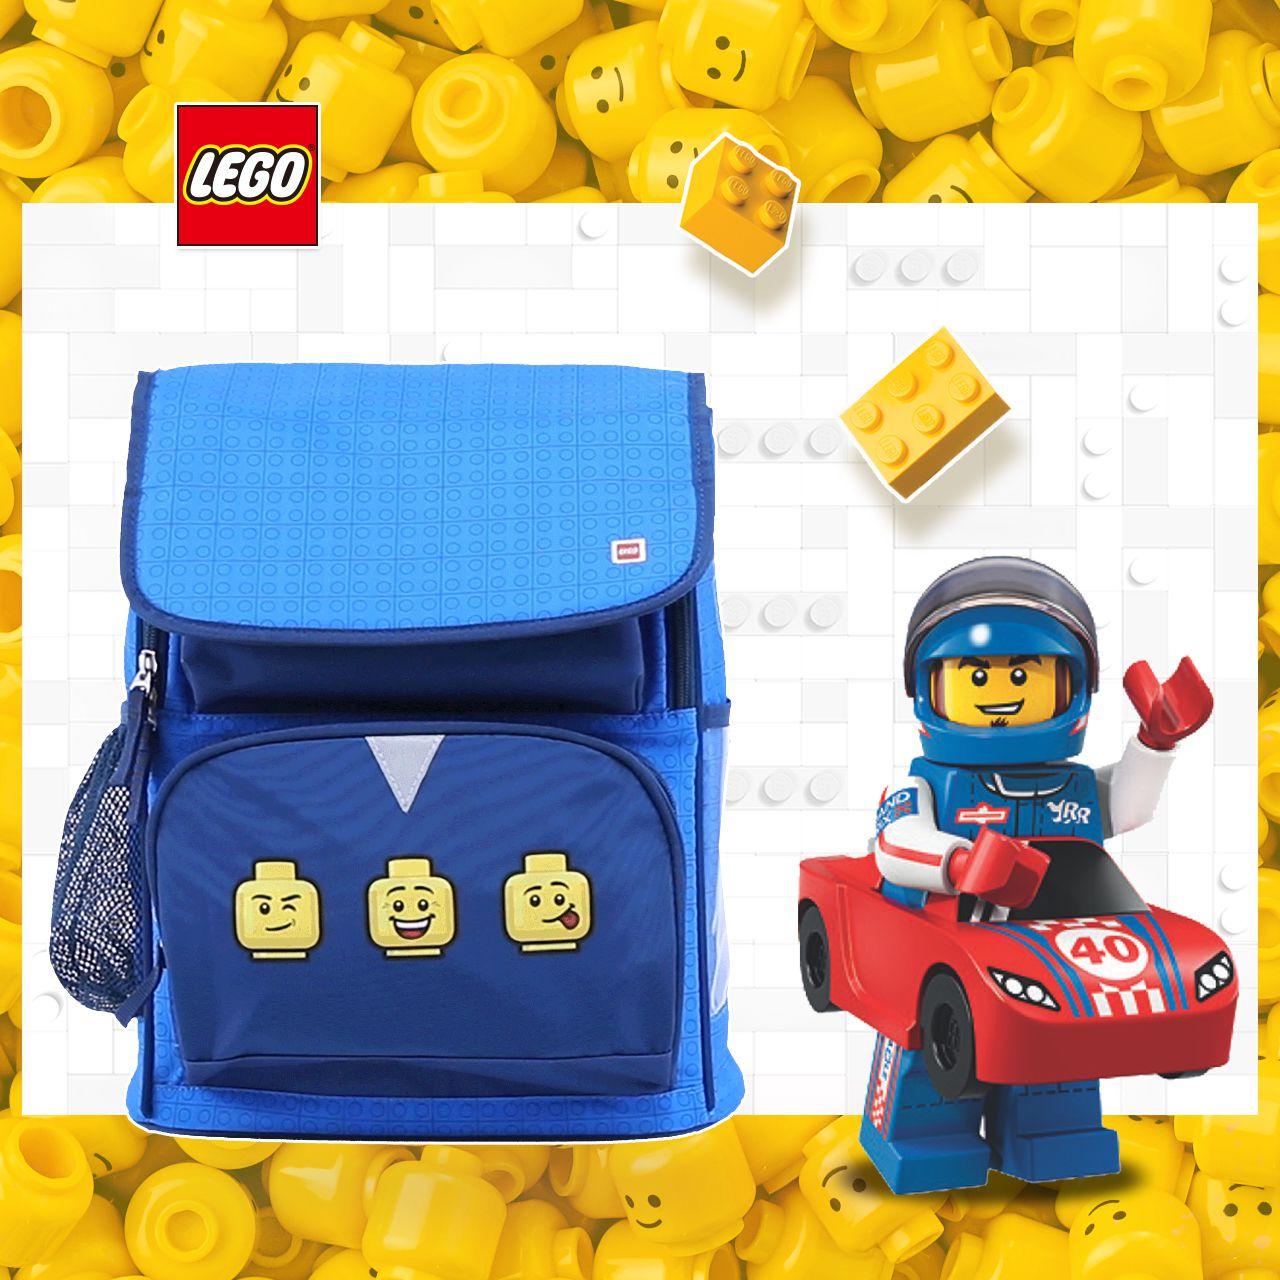 LEGO丹麥樂高書包Recruiter-表情符號藍色 20069-2006